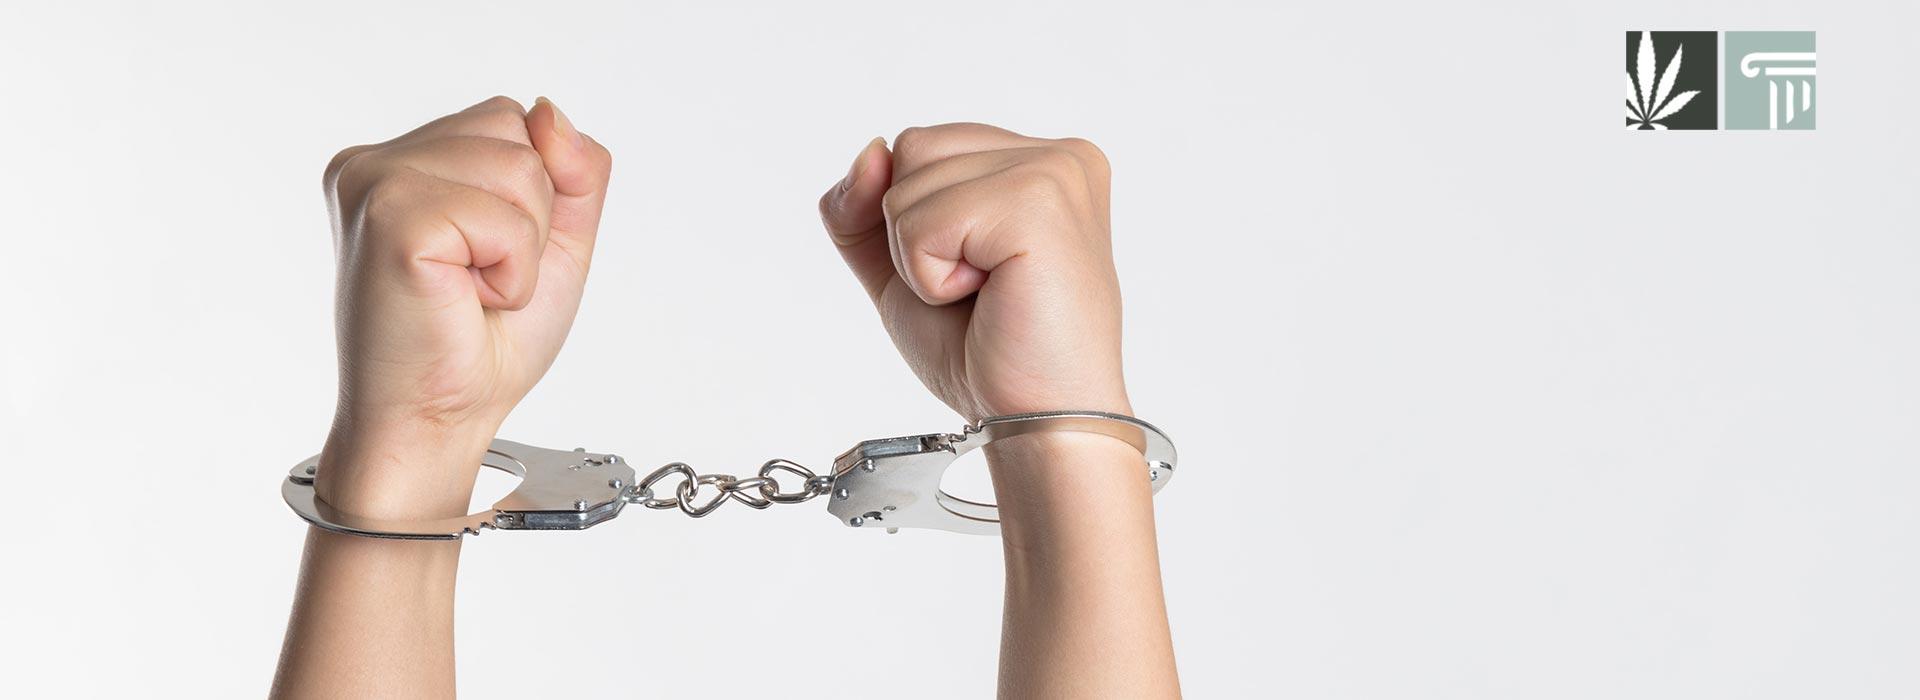 cannabis arrests decline 2020 fbi data